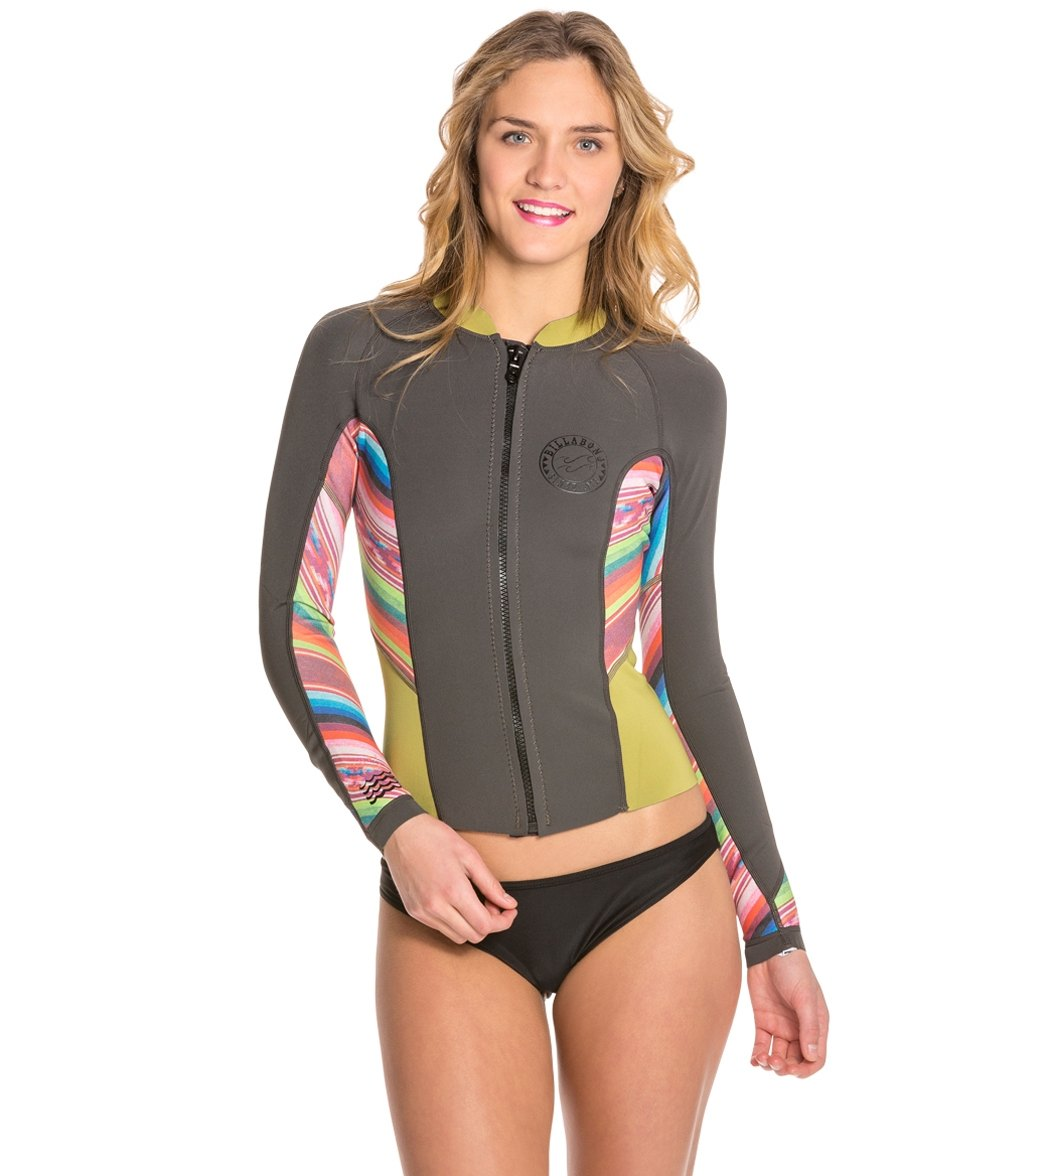 Billabong Women s Peeky Wetsuit Jacket at SwimOutlet.com - Free ... 81bbf5265